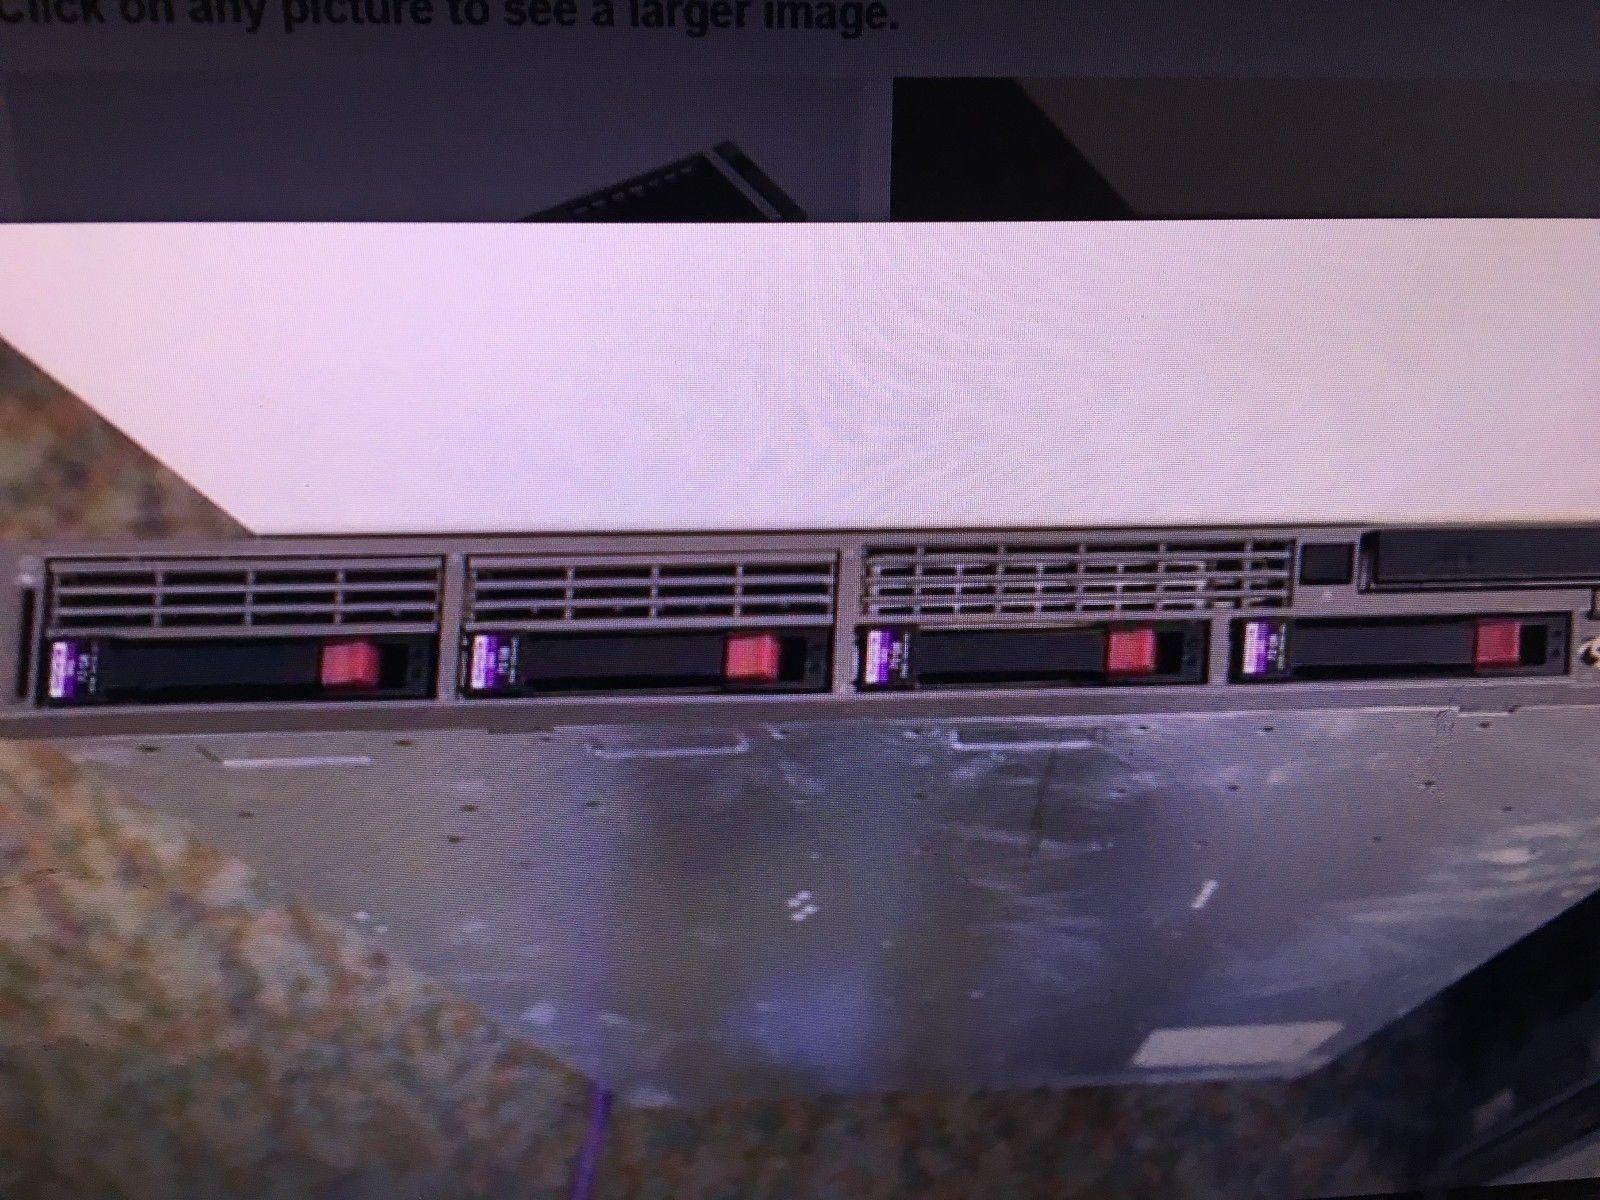 Memory Ram 4 Hp ProLiant Server DL360 G5 DL380 DL580 Upgrade GB DDR2 5300F Lot